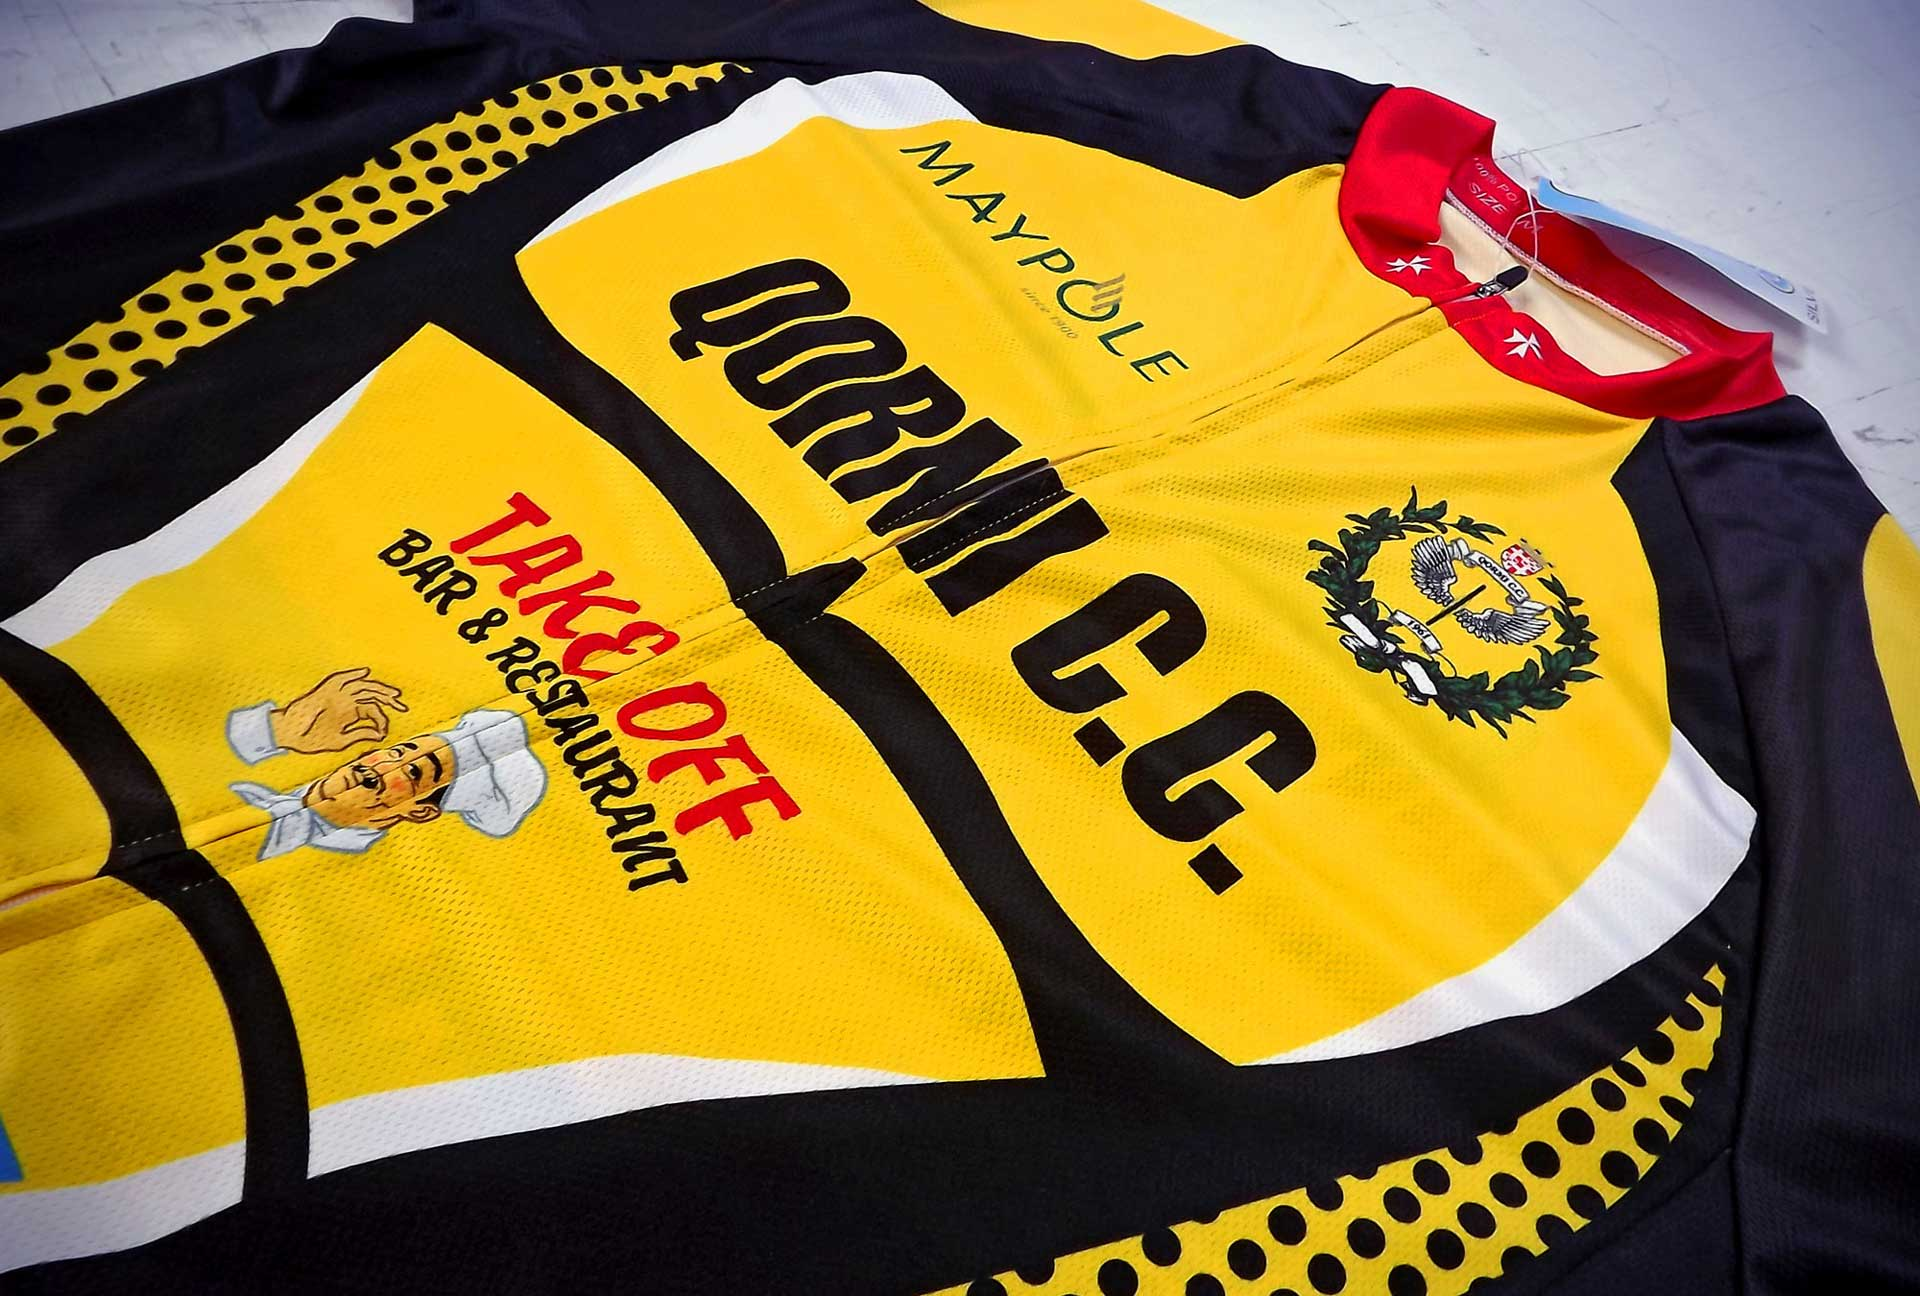 Uniform & Kits - Qormi C. C. Cycle Shirt